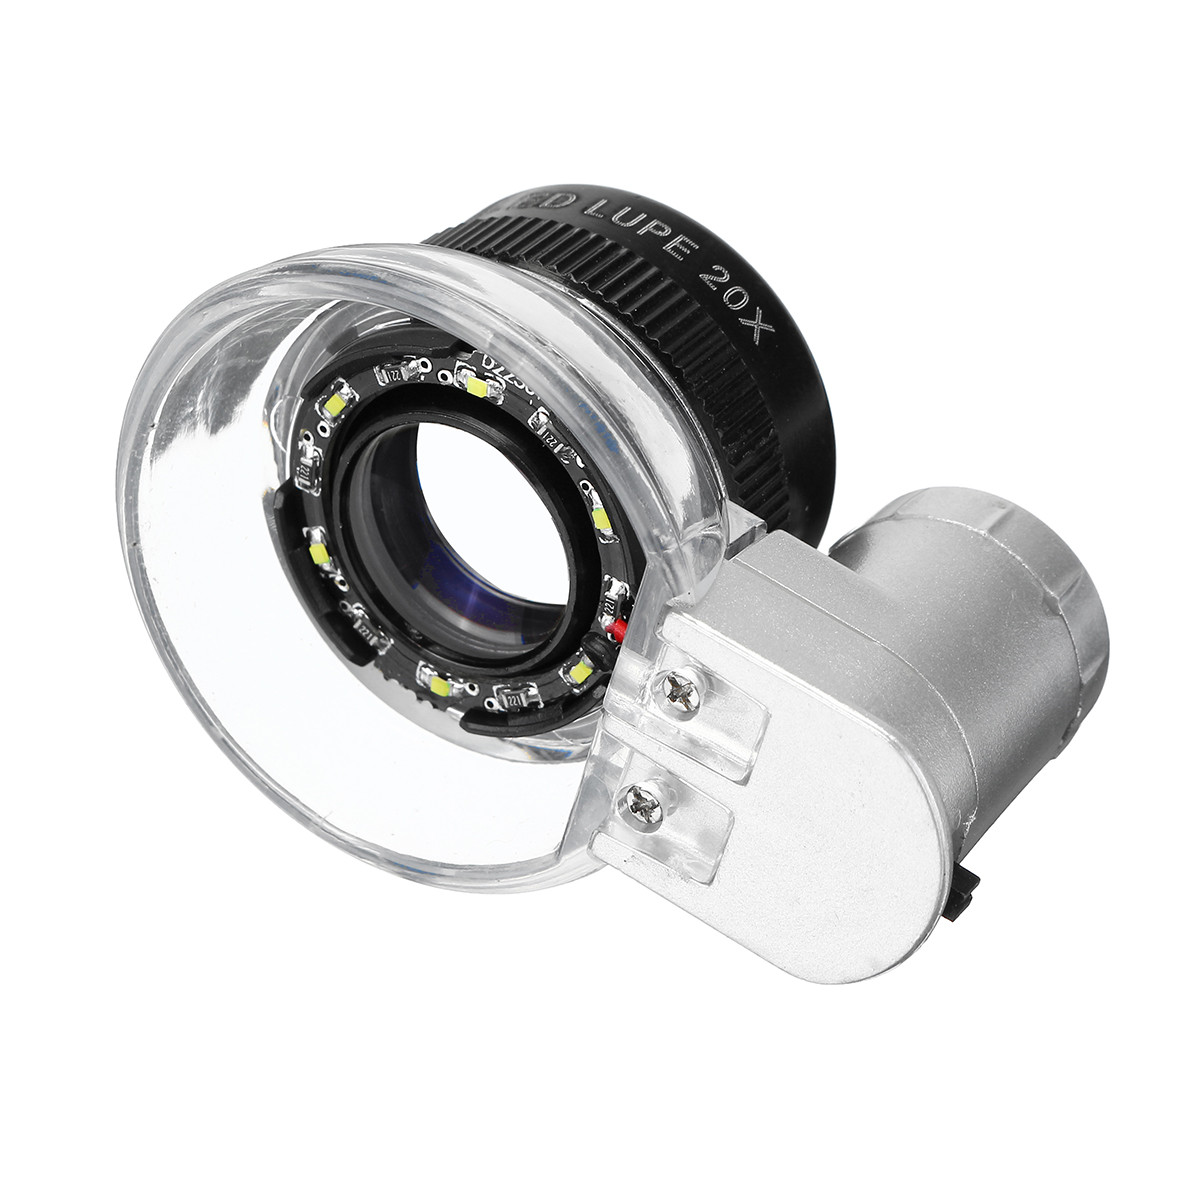 20X Magnifier Magnifier LED Loupe Light Jewelry Оптическое стекло Увеличение - 1TopShop